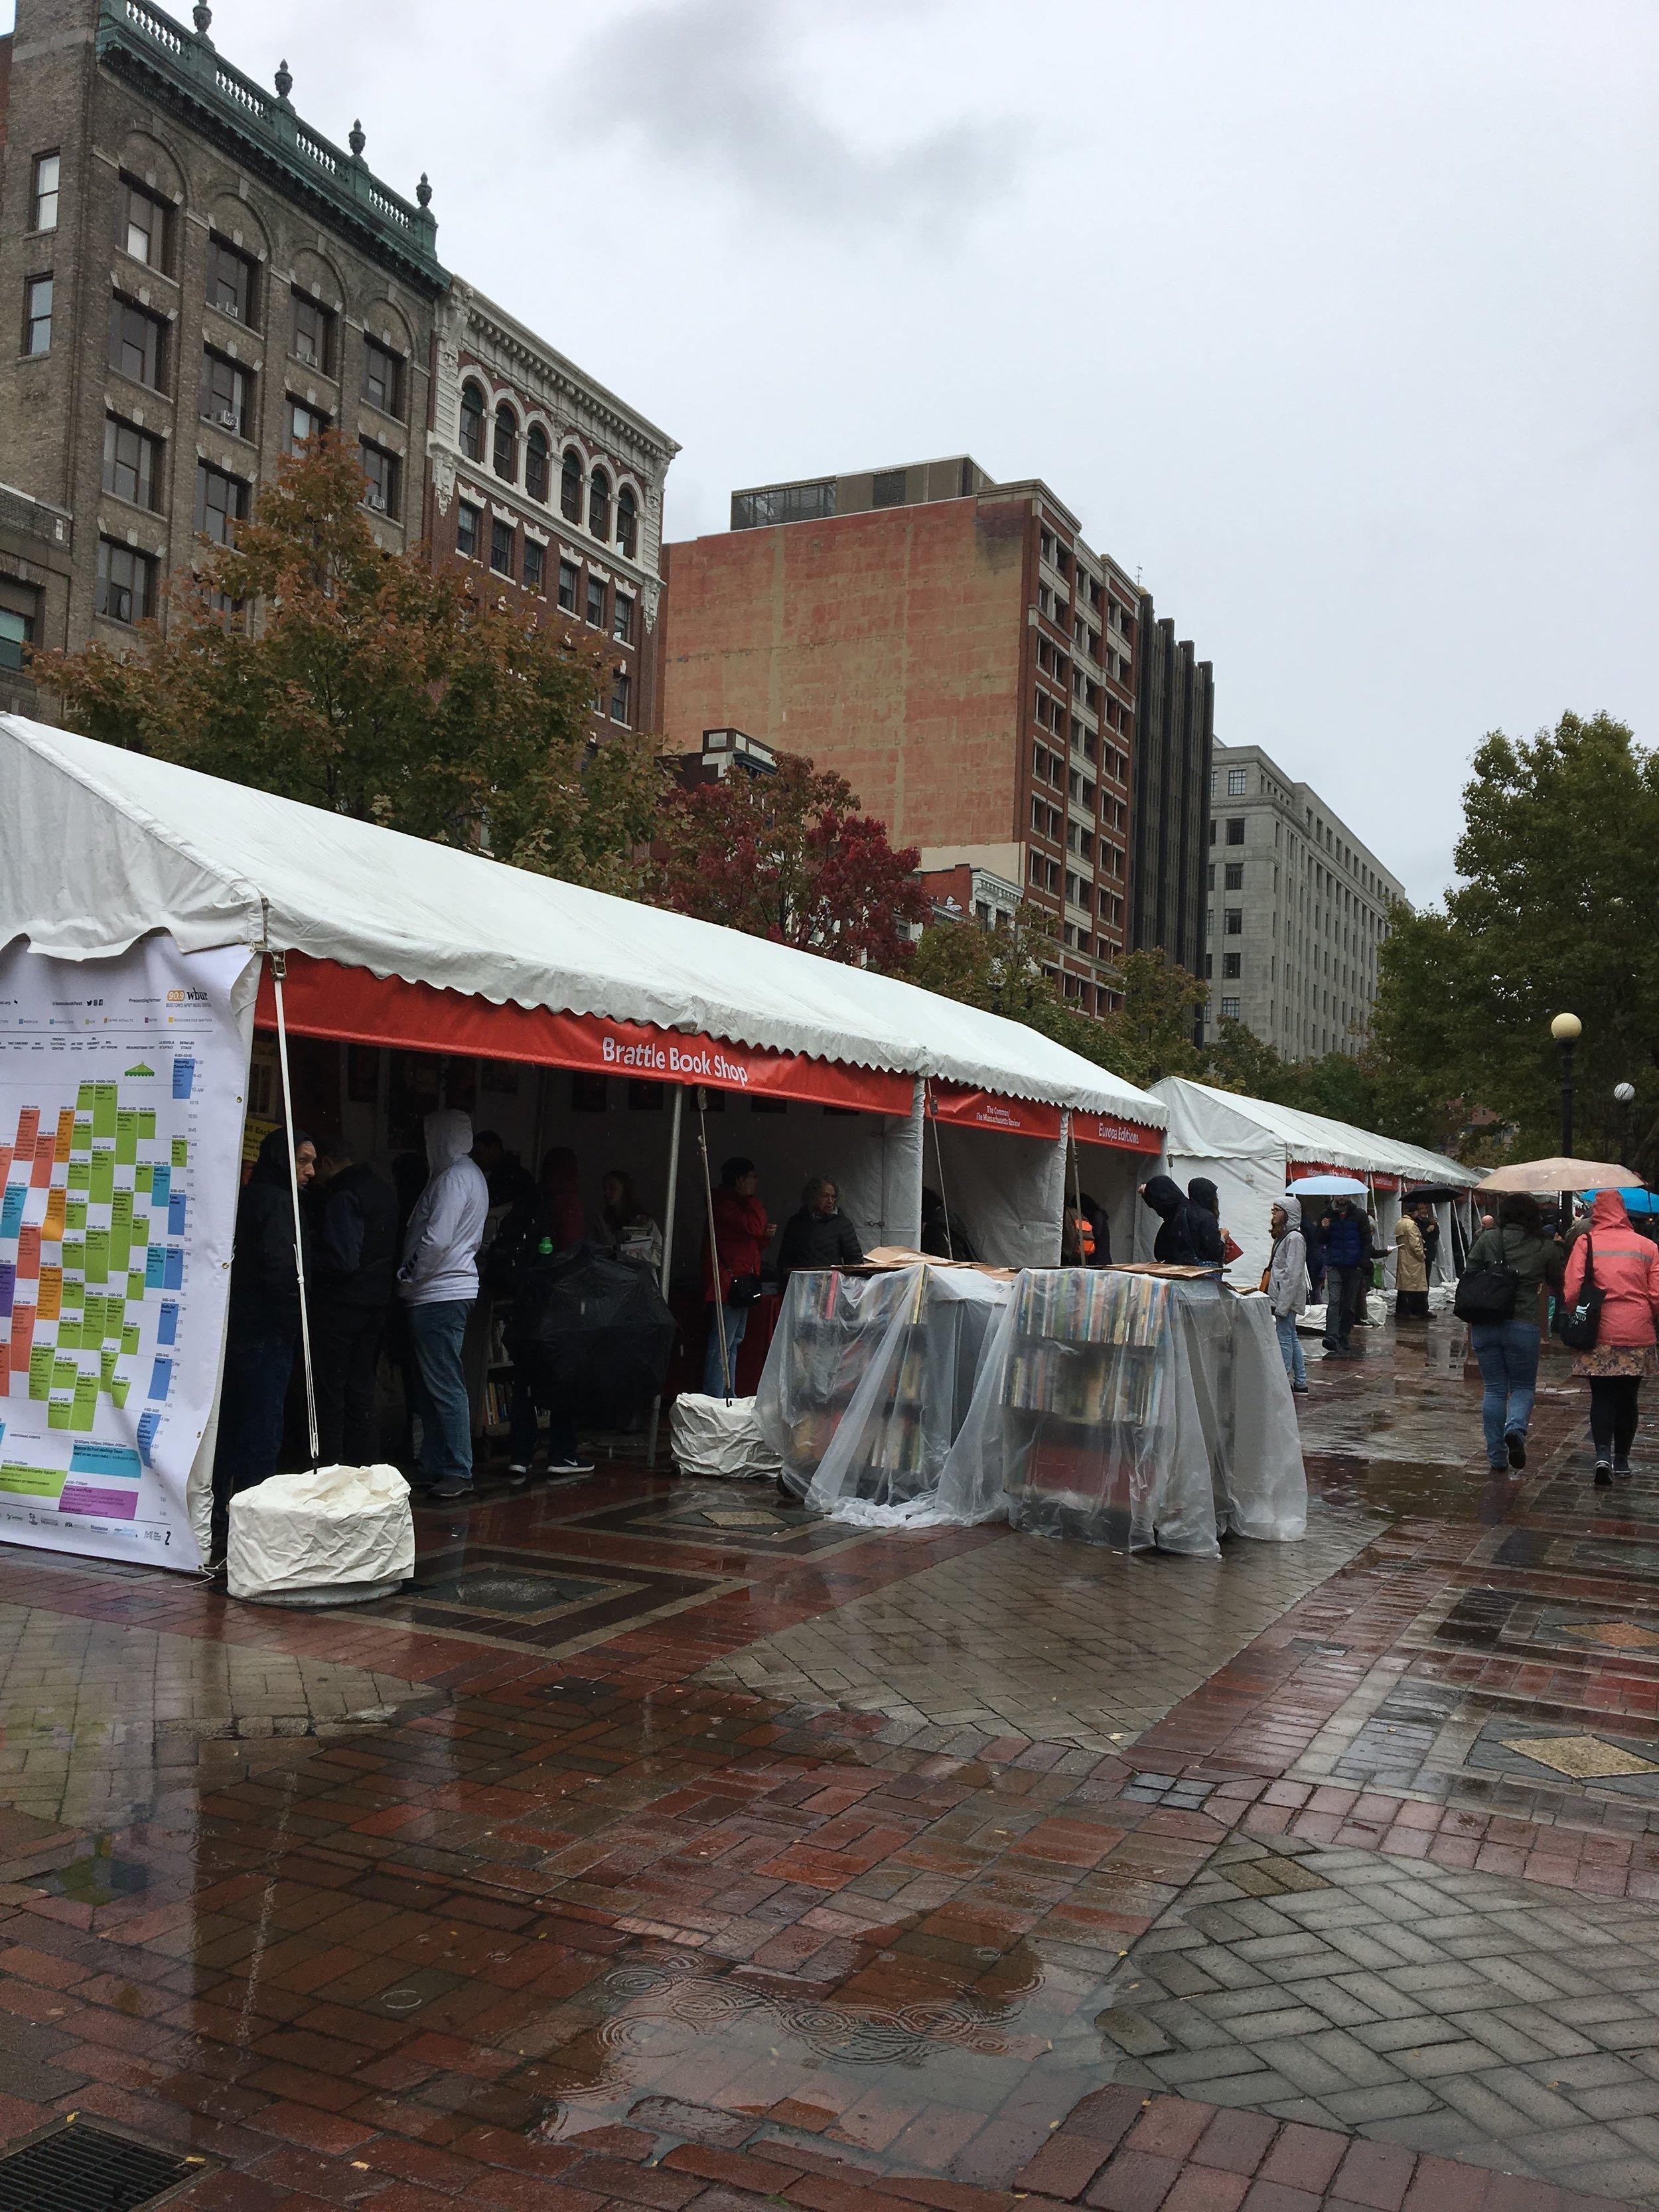 boston-book-fest-2018-featured-image.JPG